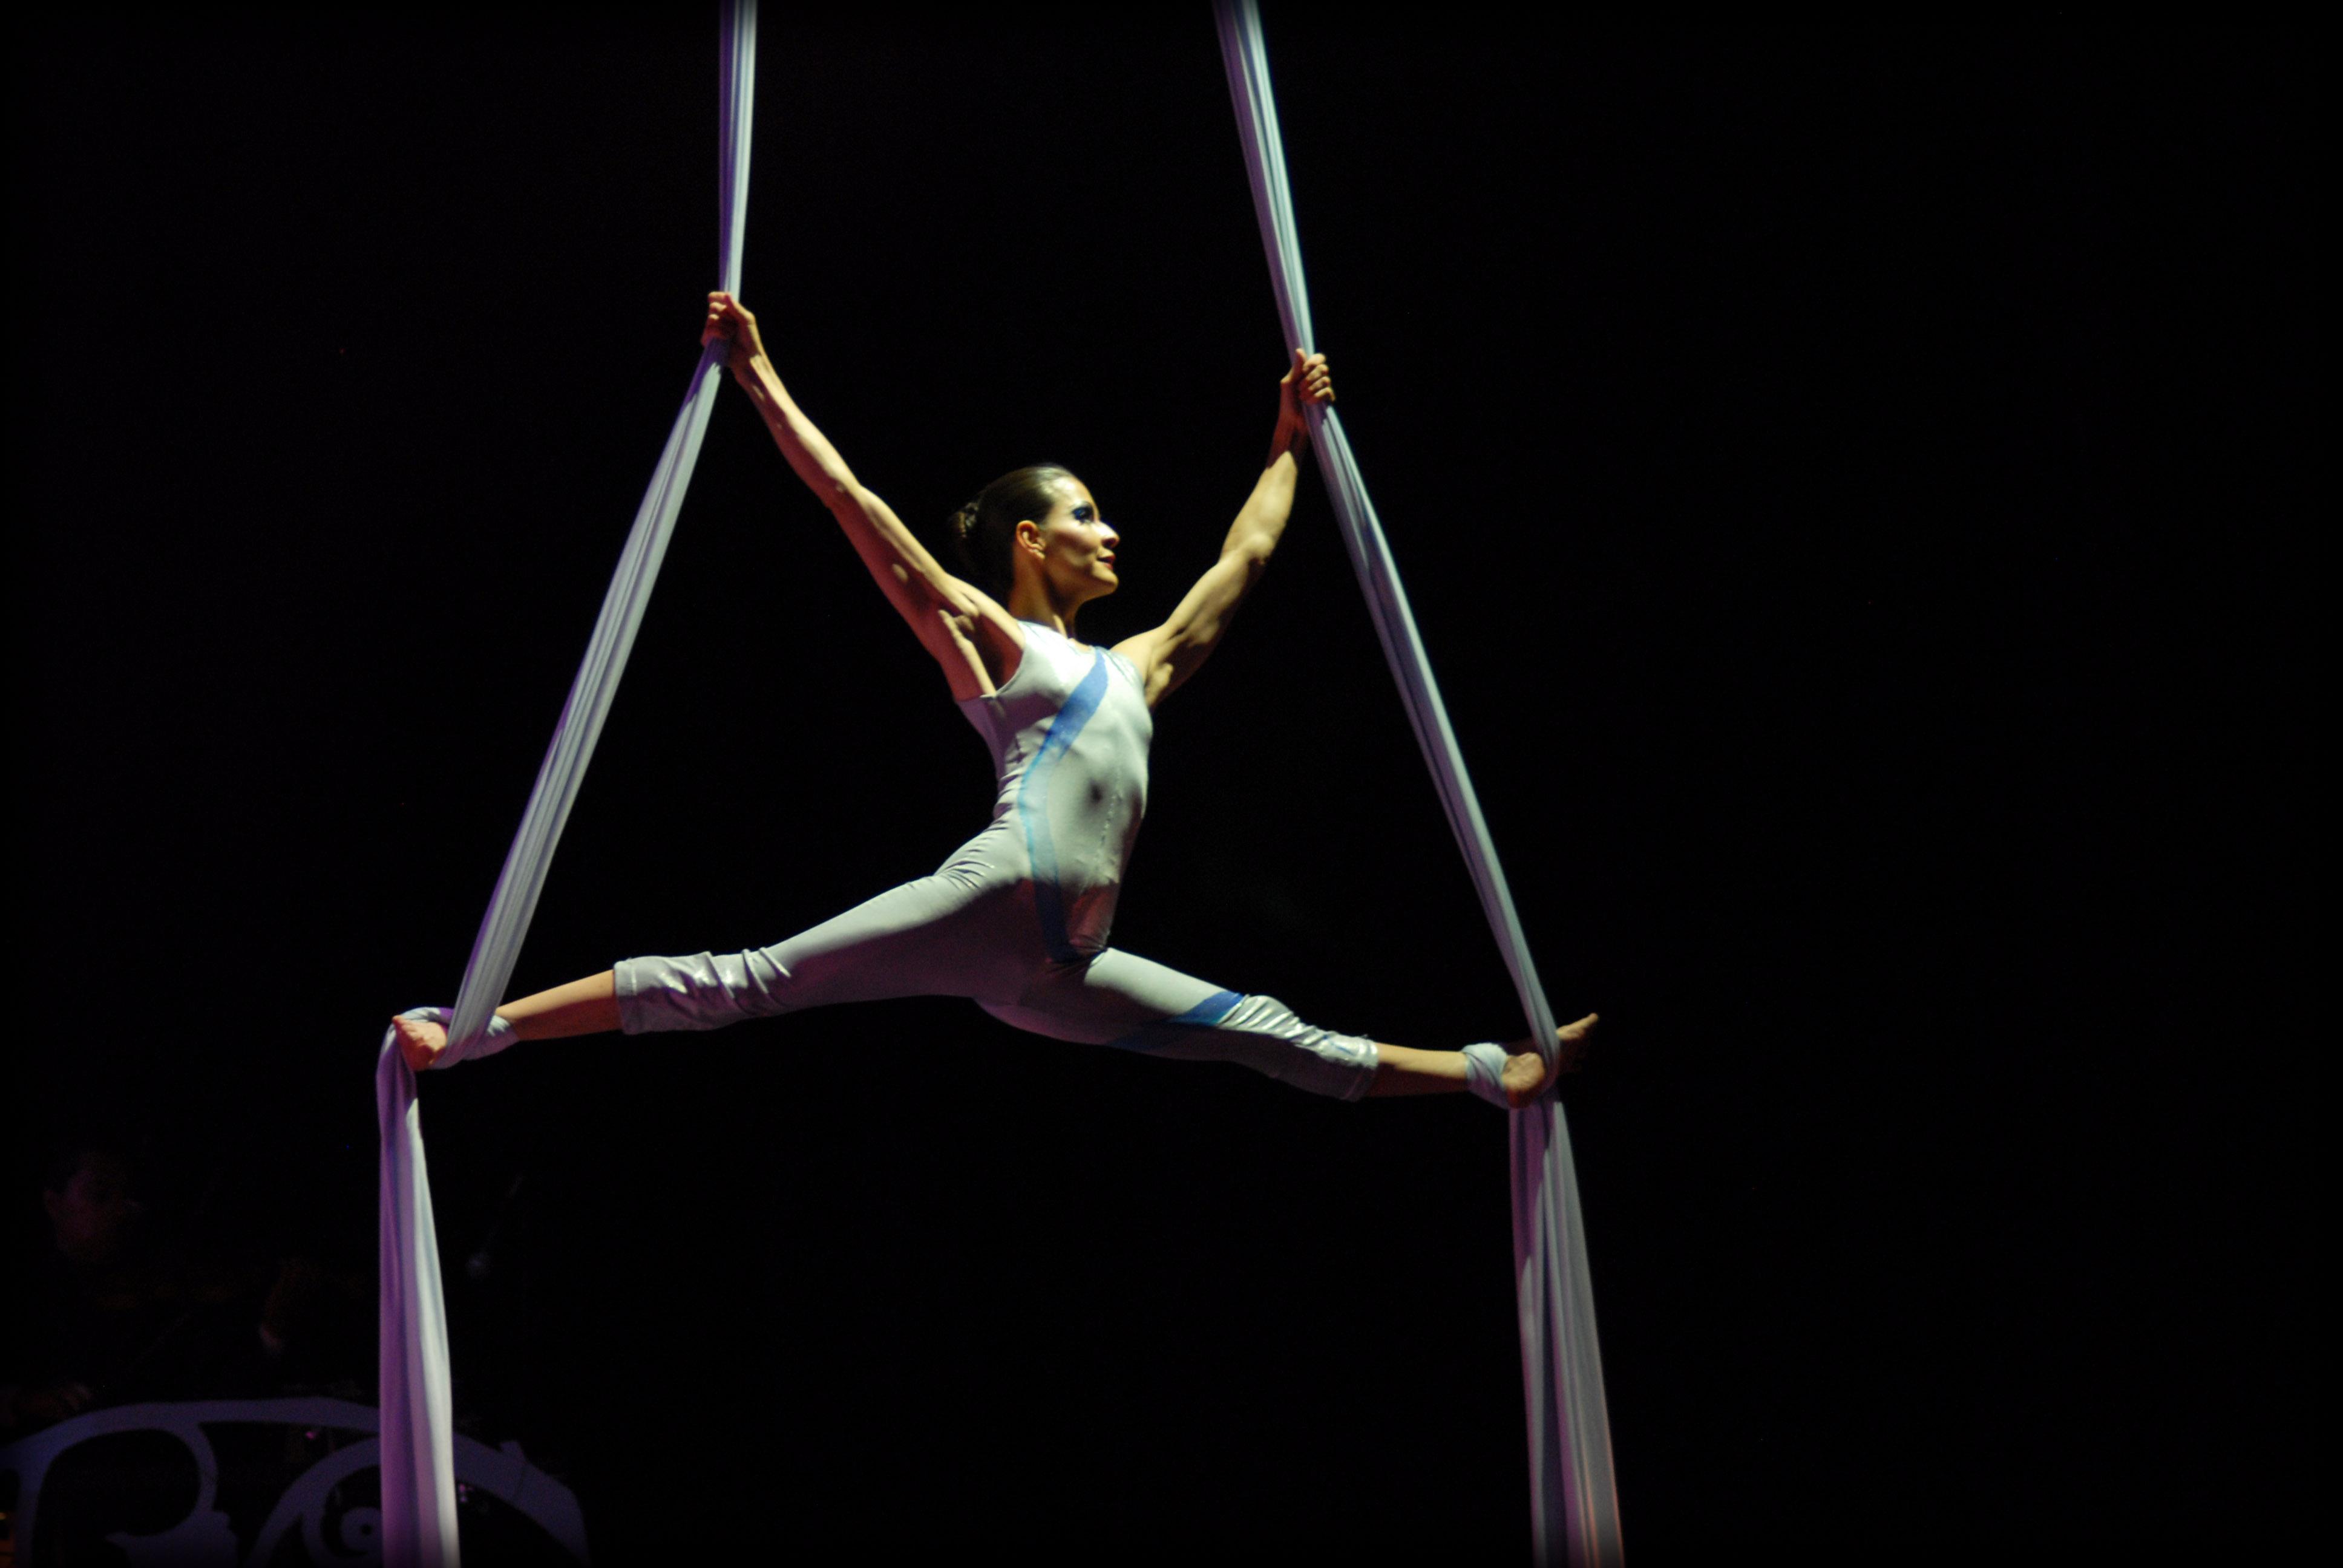 danza-aerea-58944